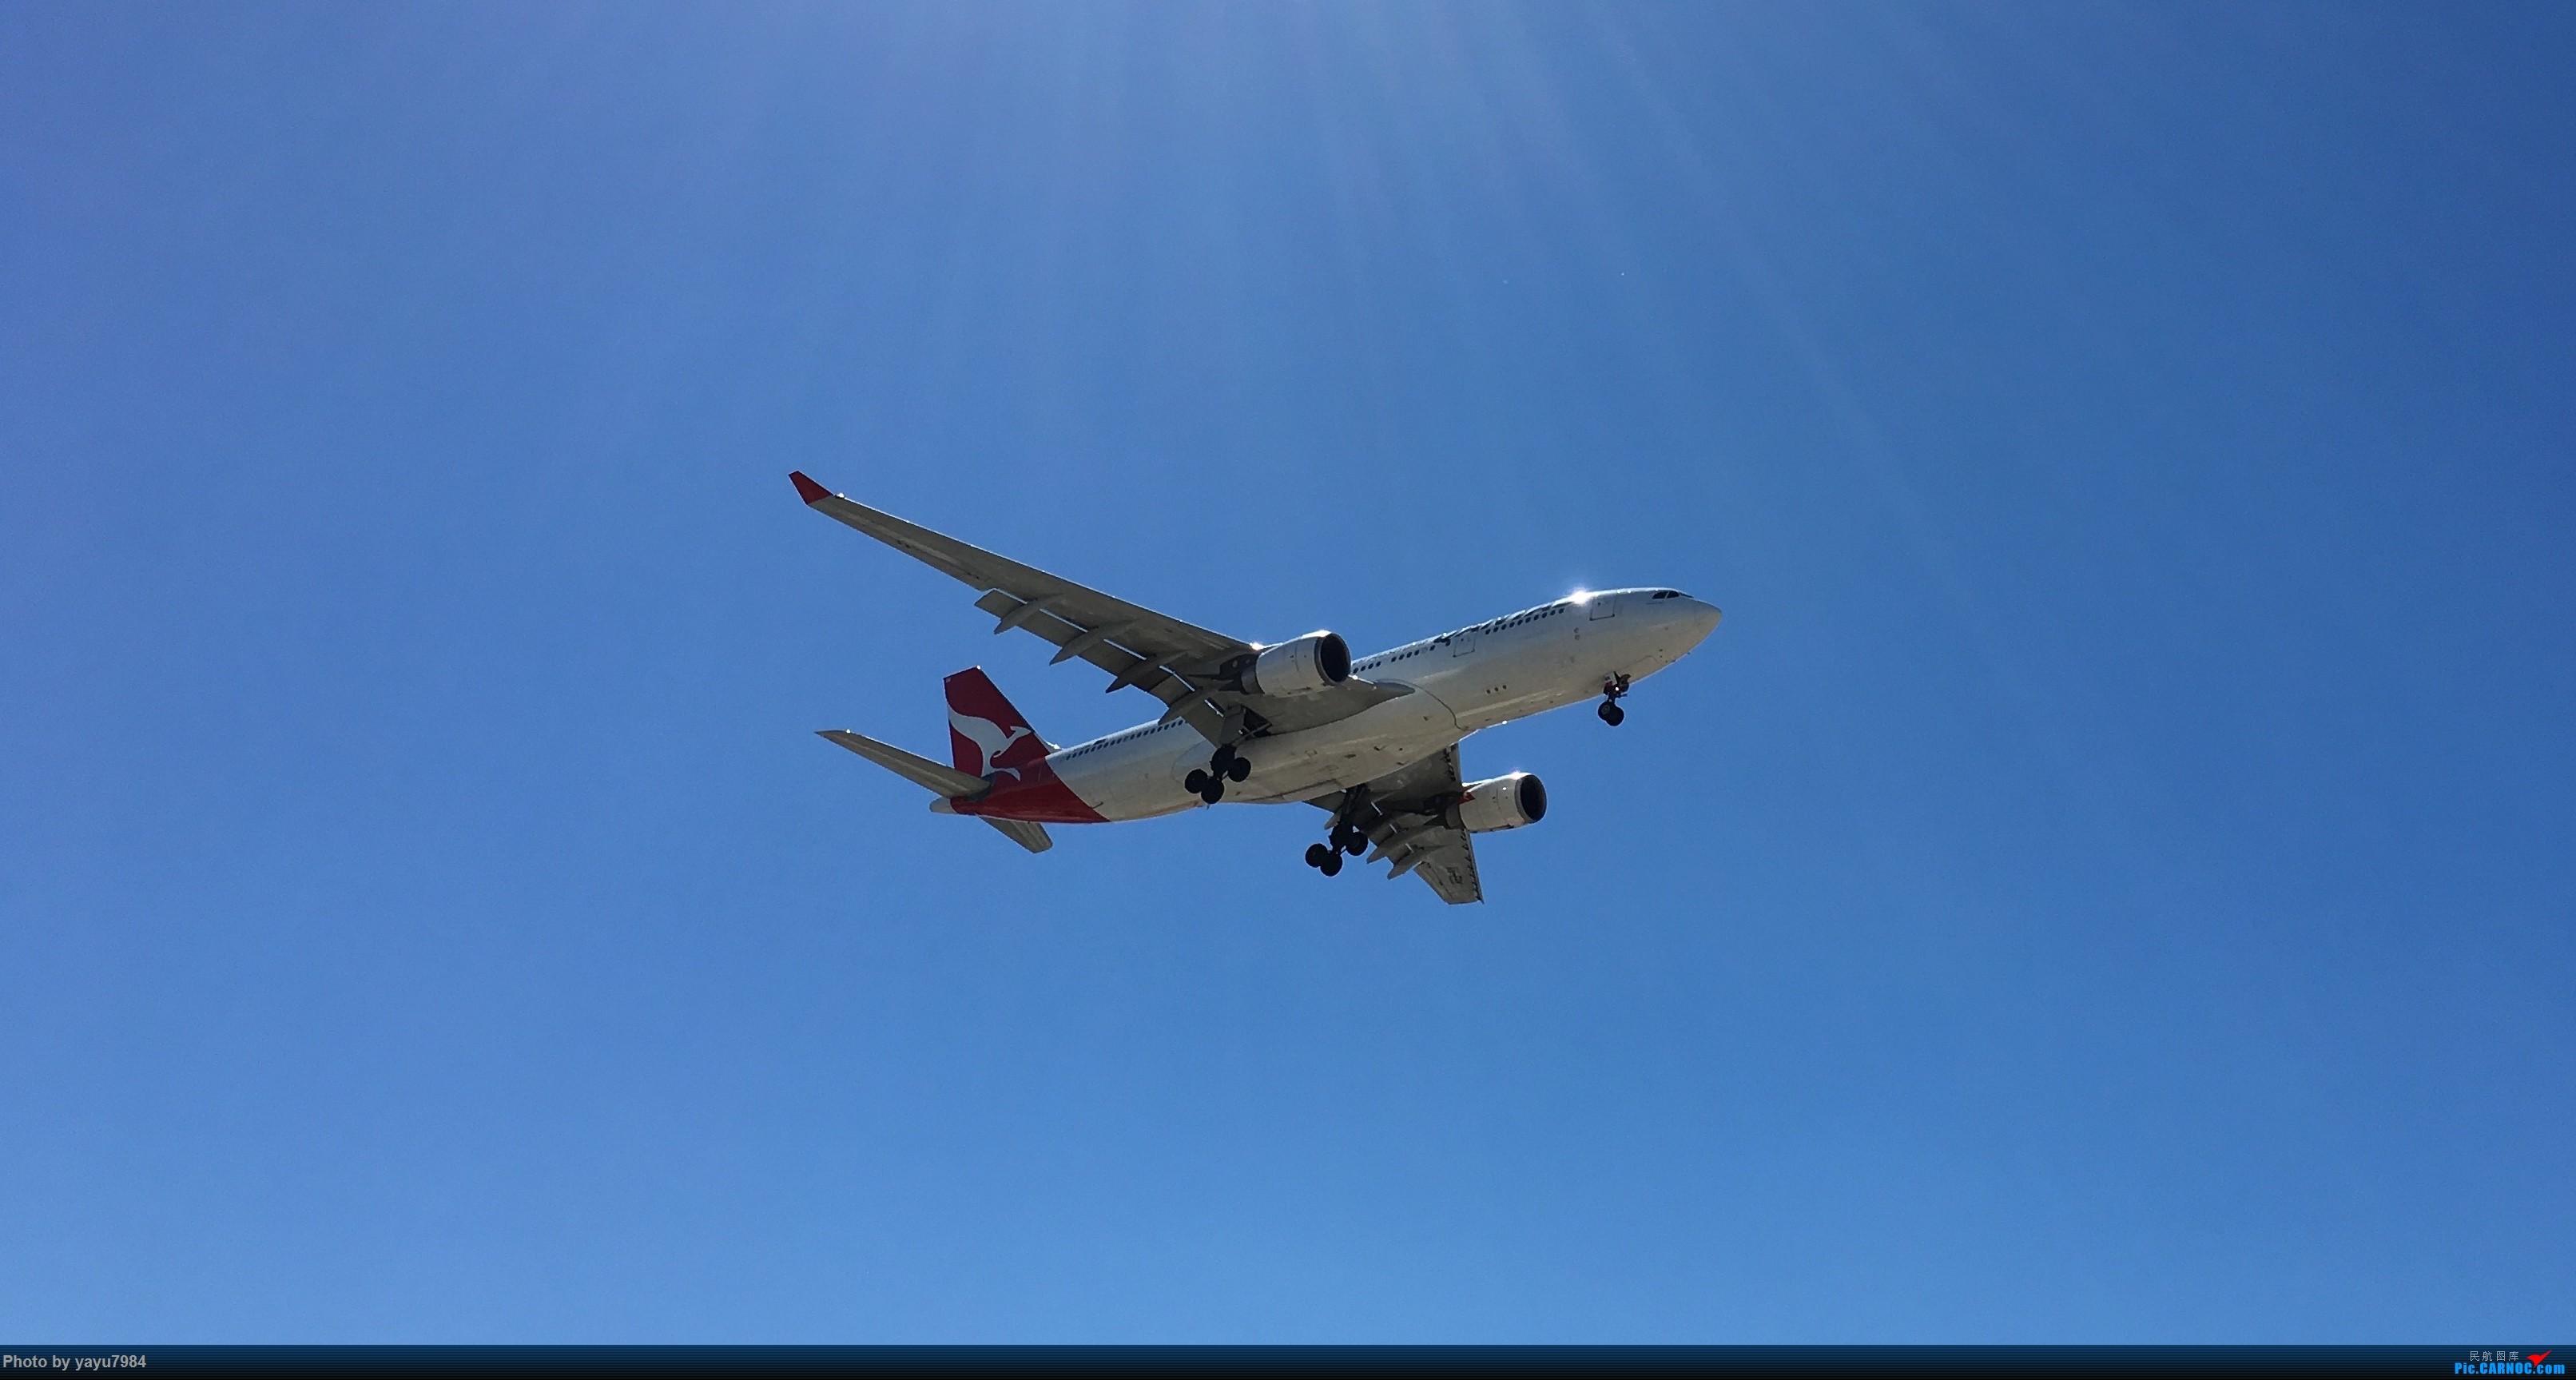 Re:[原创][SYD] 久违的南向起降,纪录16R拍机之行 AIRBUS A330-200 VH-EBK 澳大利亚悉尼金斯福德·史密斯机场